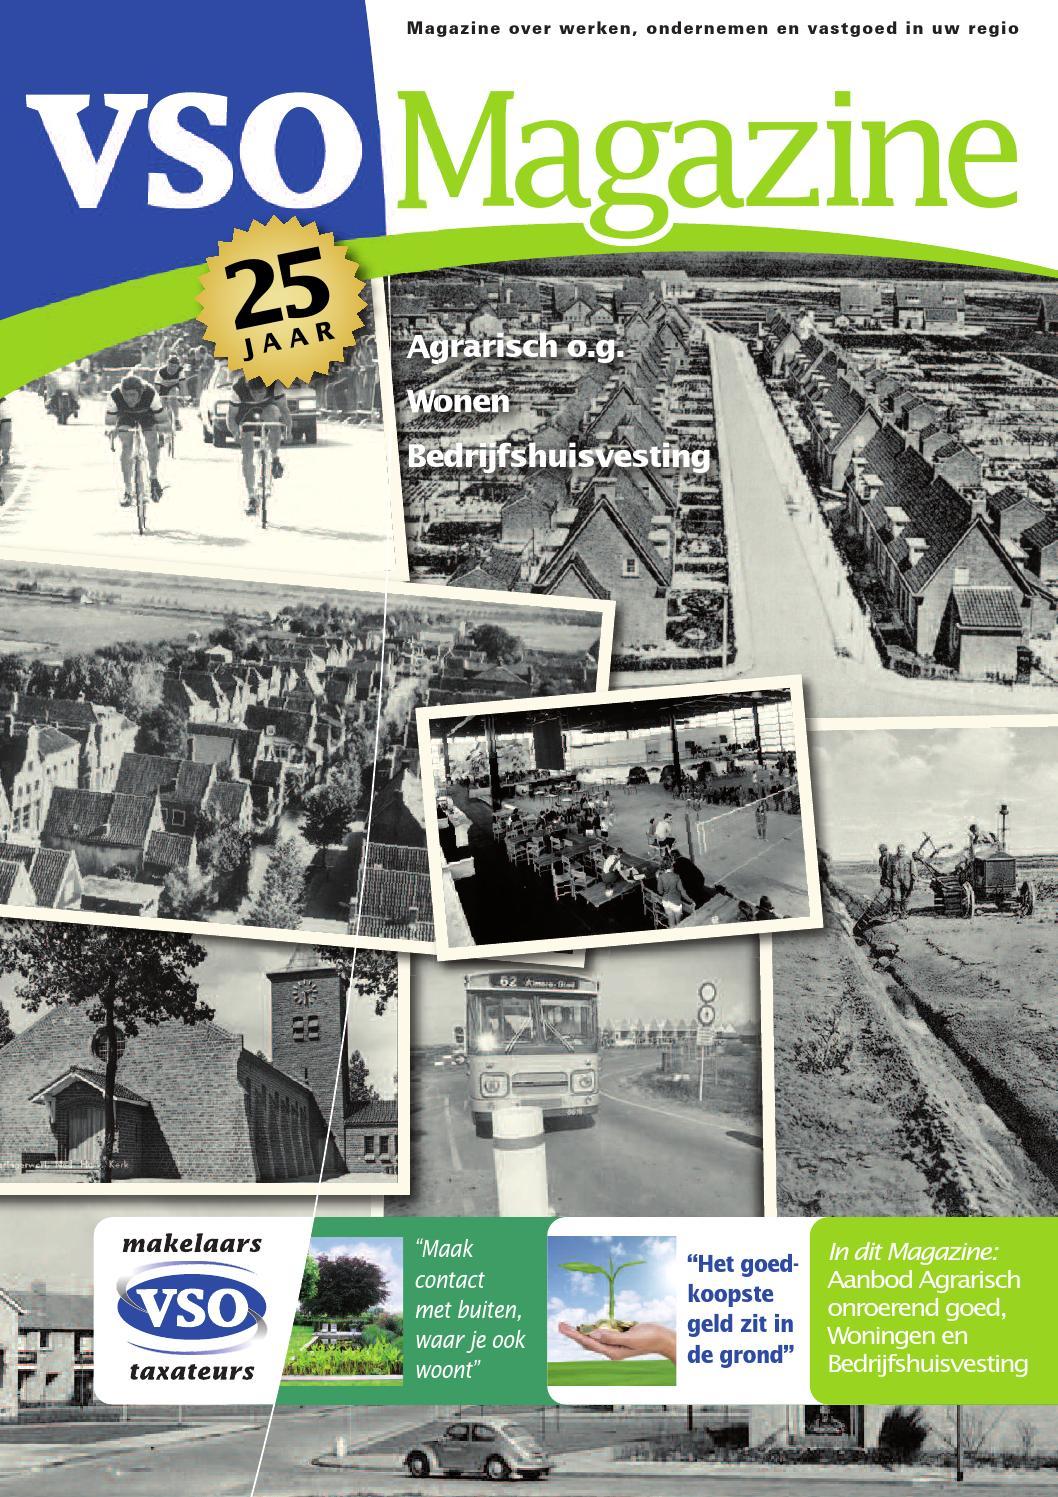 Vso magazine: 25 jaar vso makelaars by d.j. visser   issuu